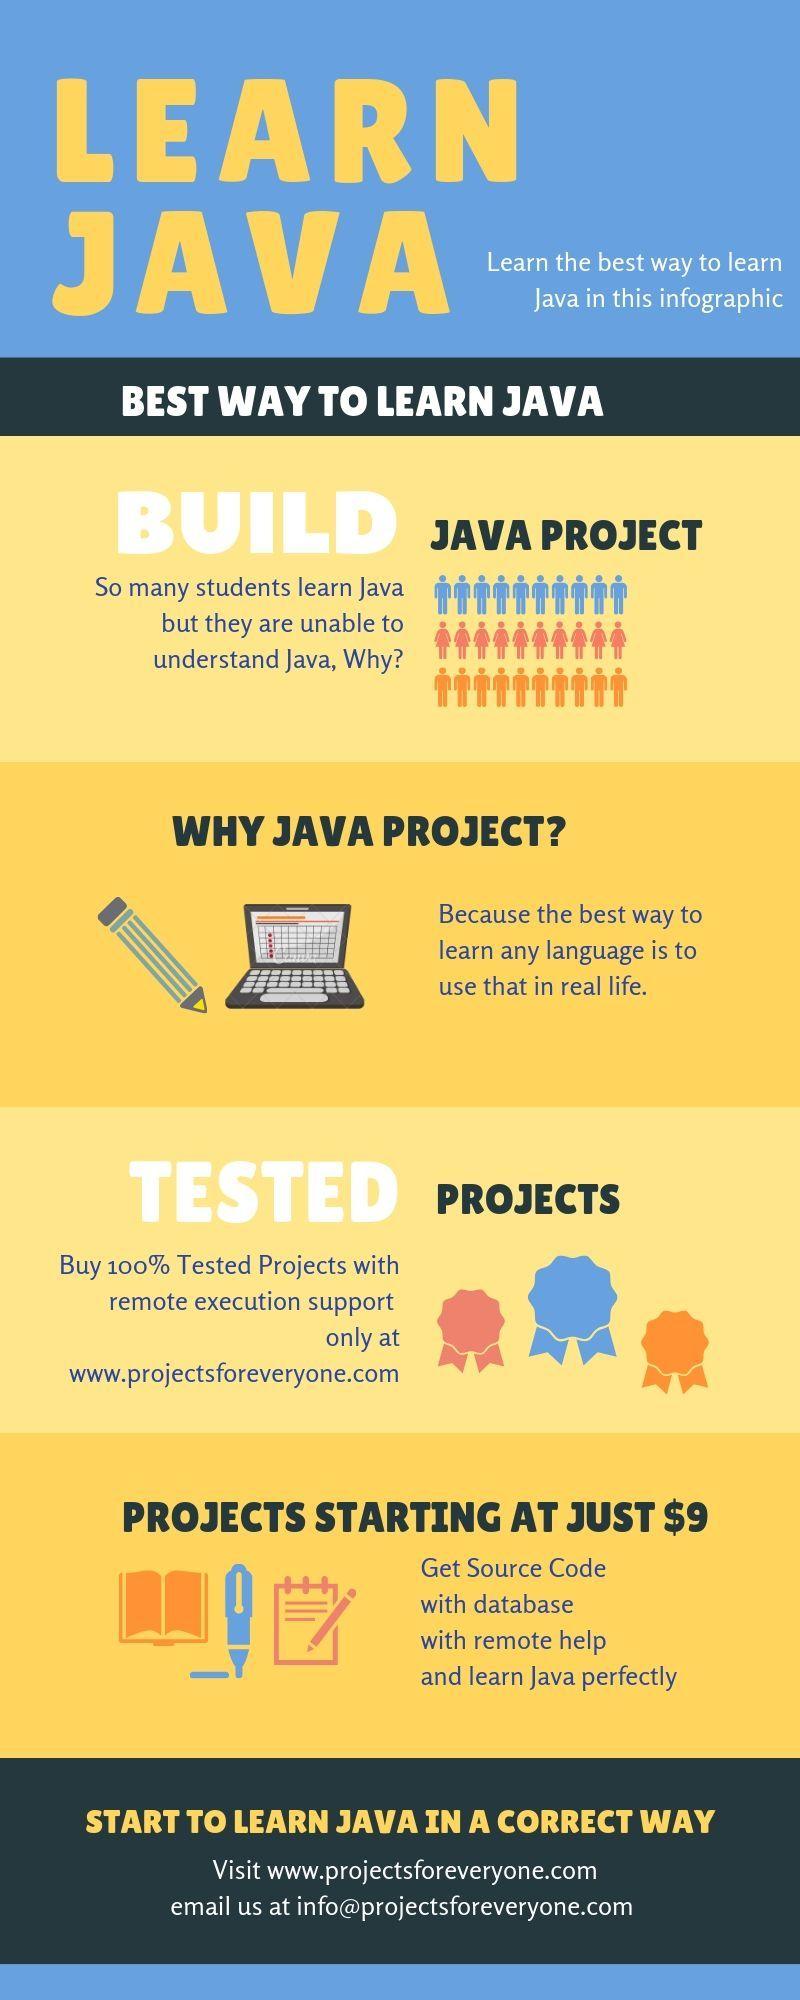 Learn Java the correct way Logistics management